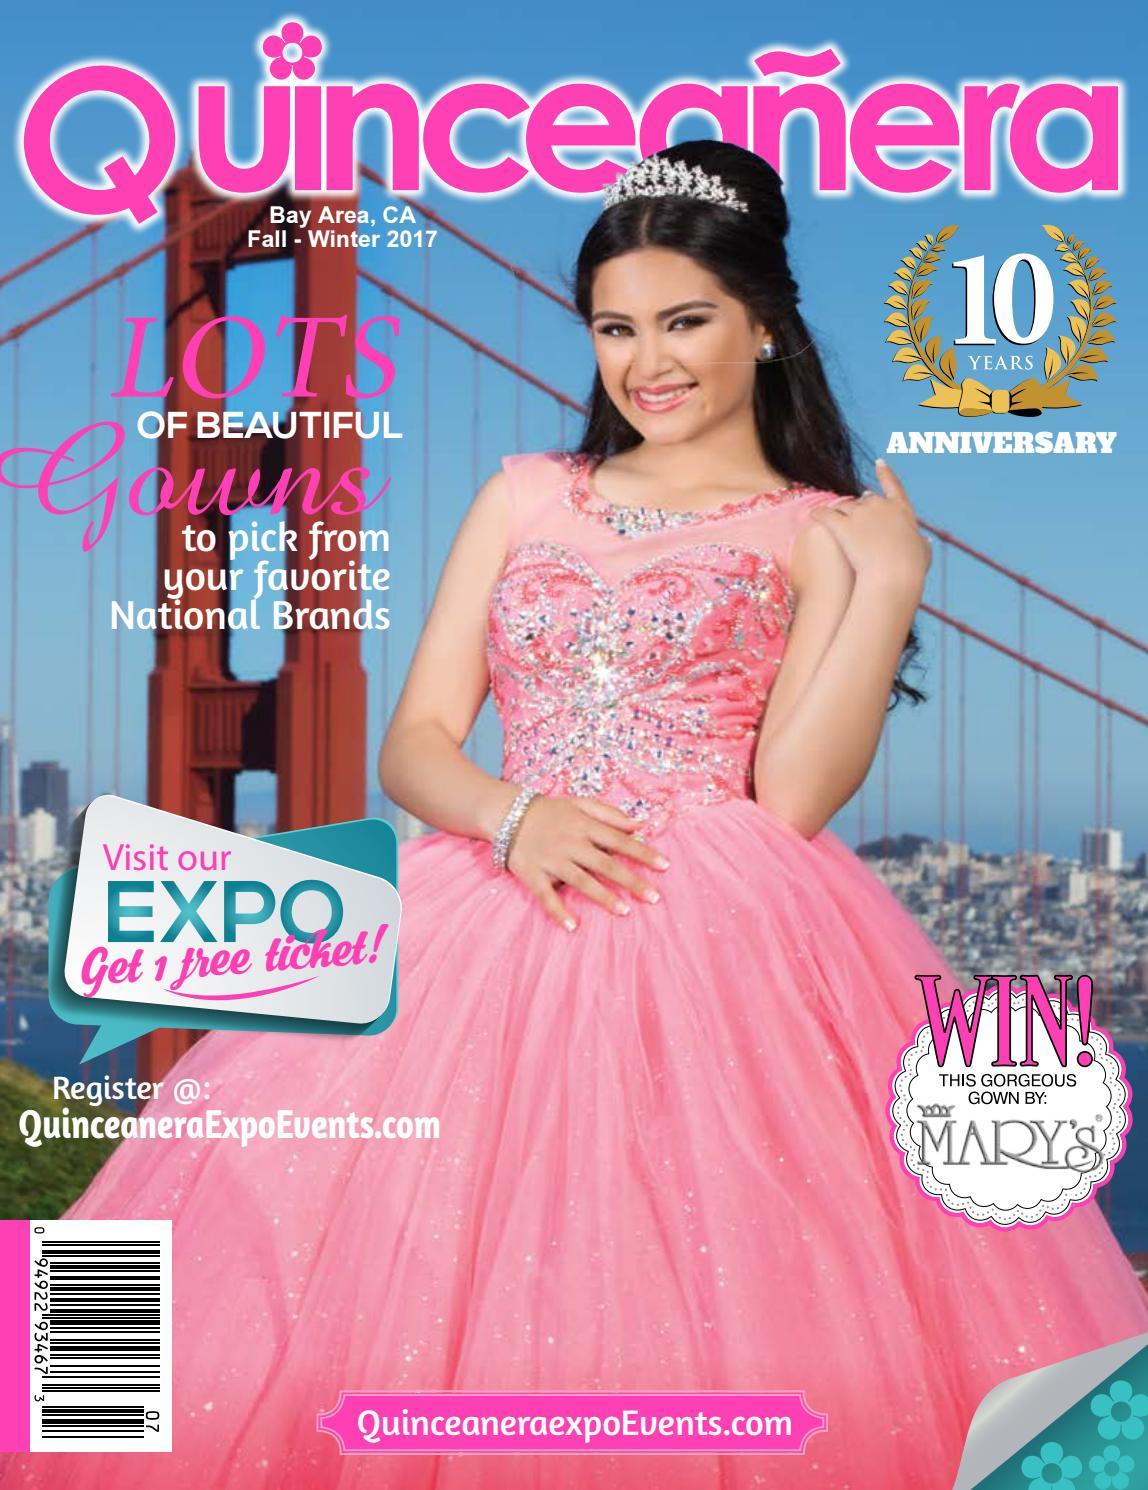 Quinceanera Magazine Bay Area Sept 2017 by Quinceañera Magazine - issuu